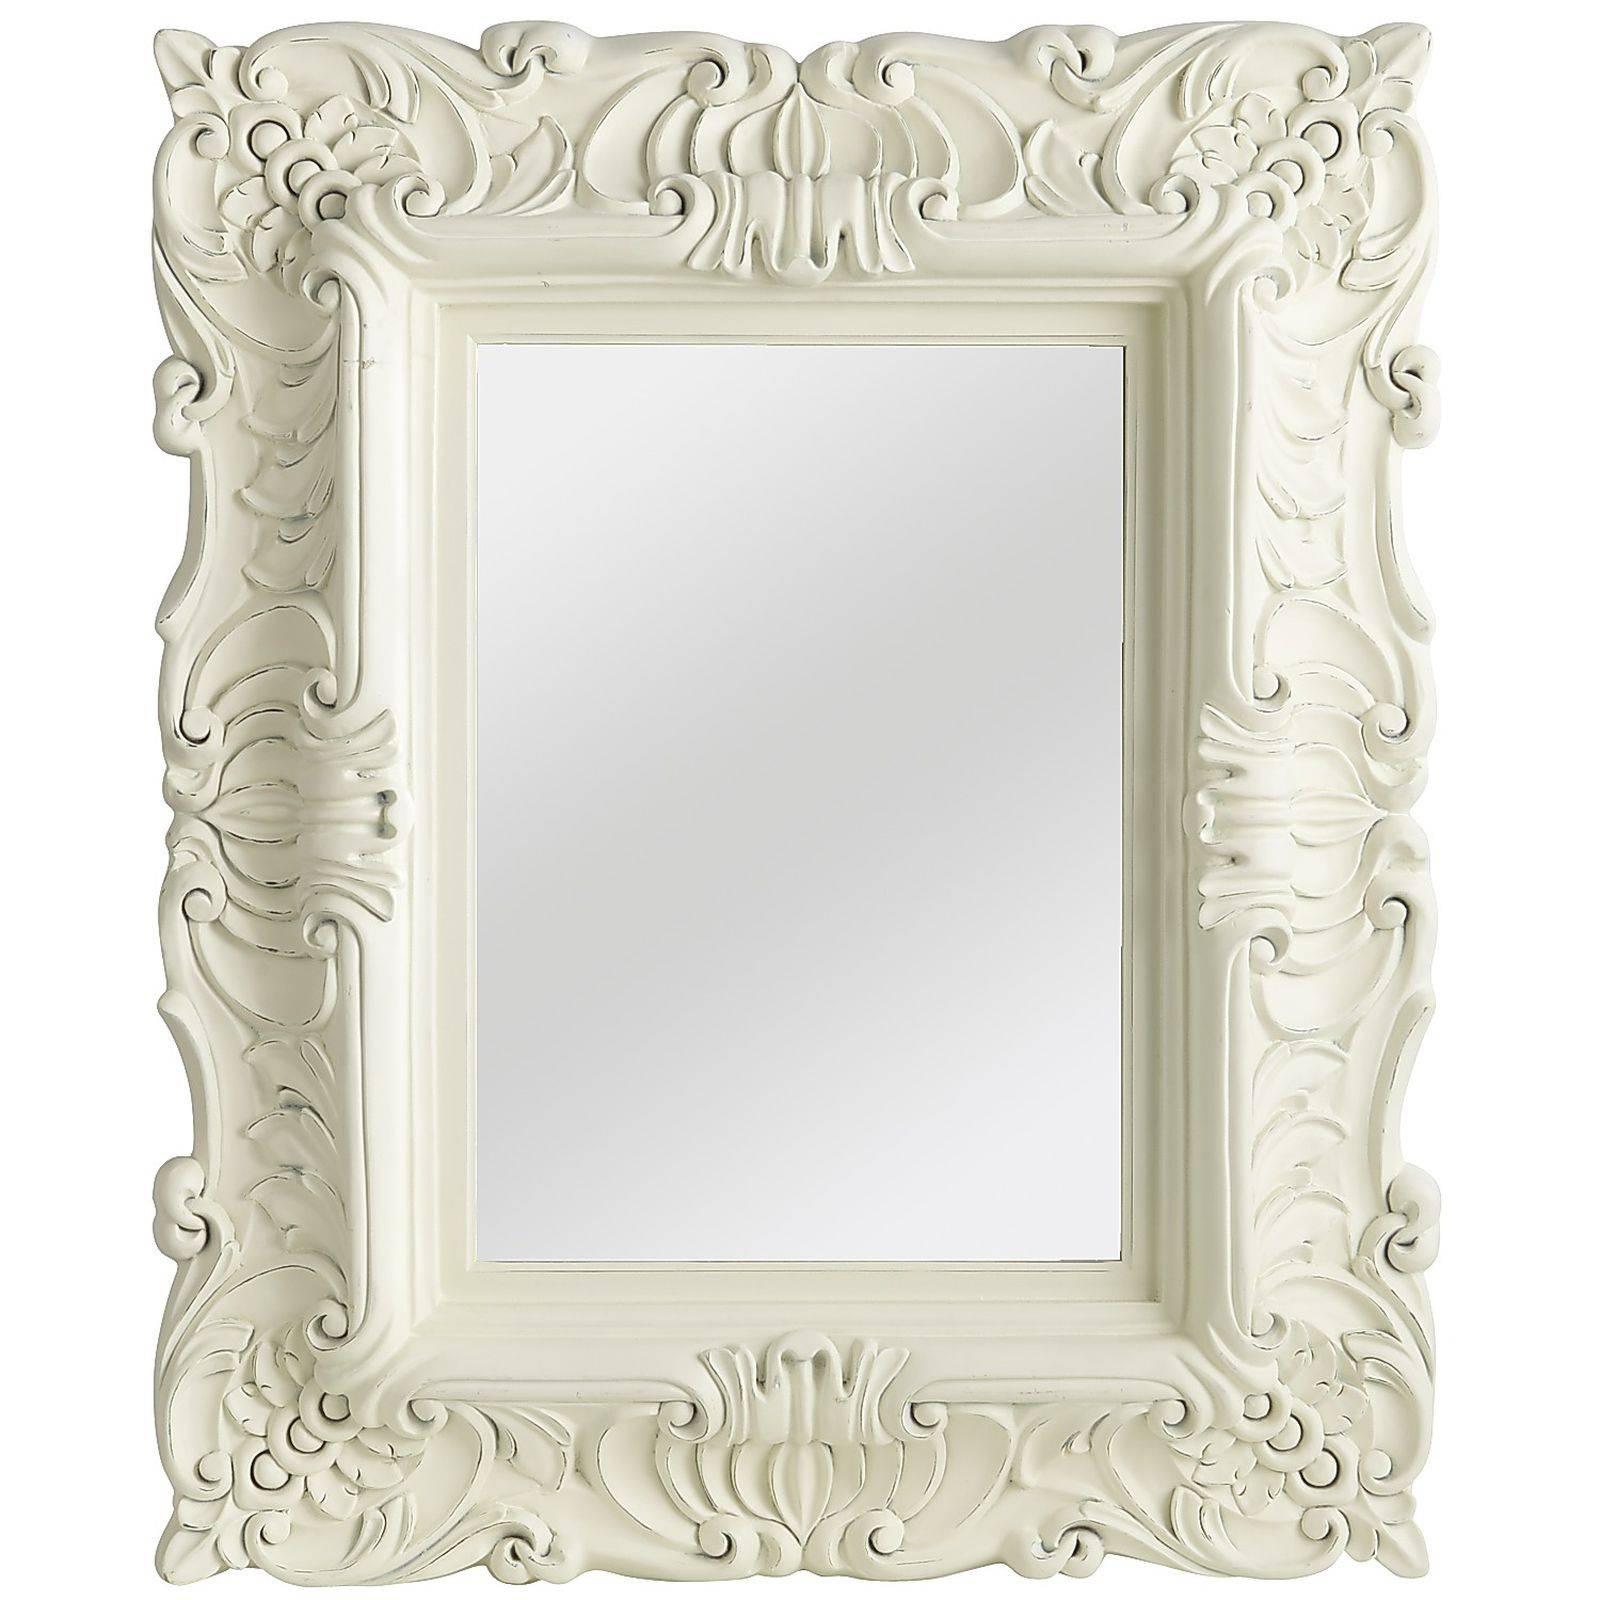 Bathroom: Astounding Baroque Mirror With Unique Frame For Bathroom with Cheap Baroque Mirrors (Image 11 of 25)